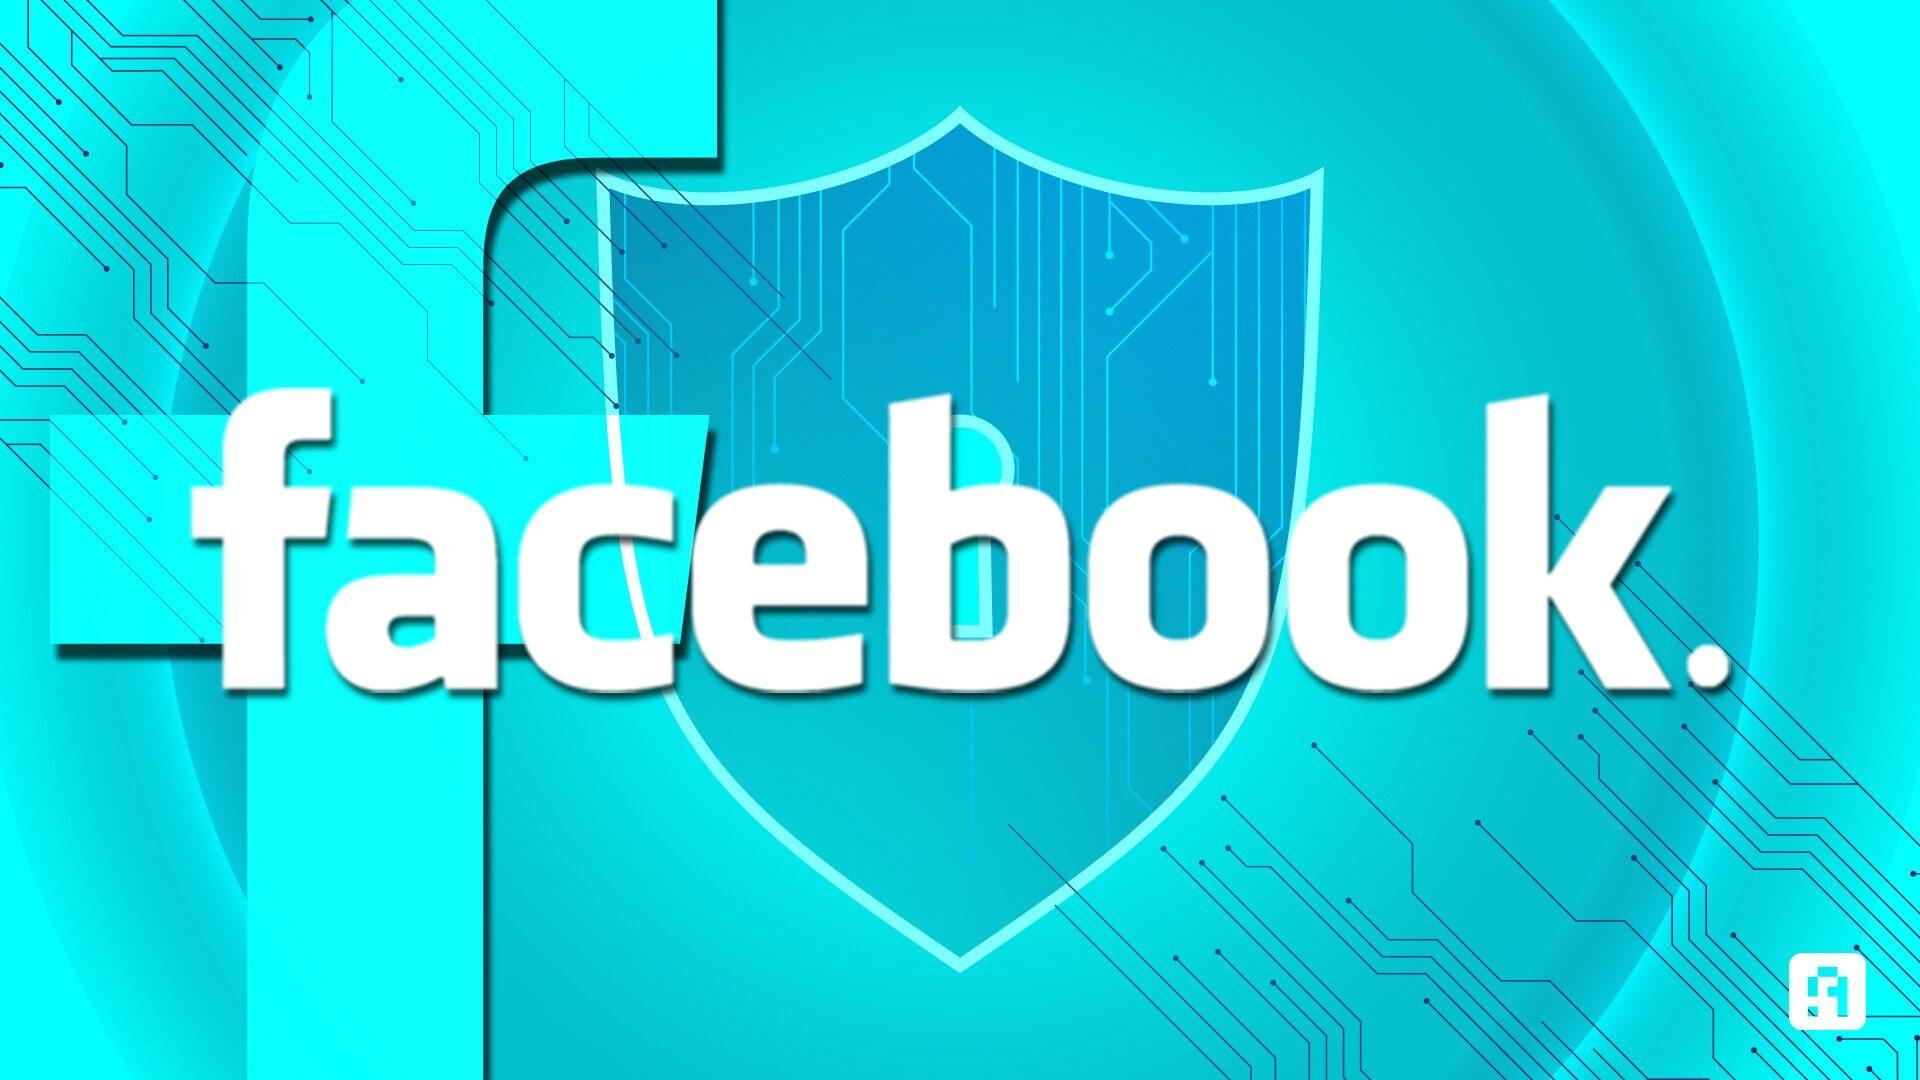 Facebook فيسبوك - Arabhardware Generic Photos